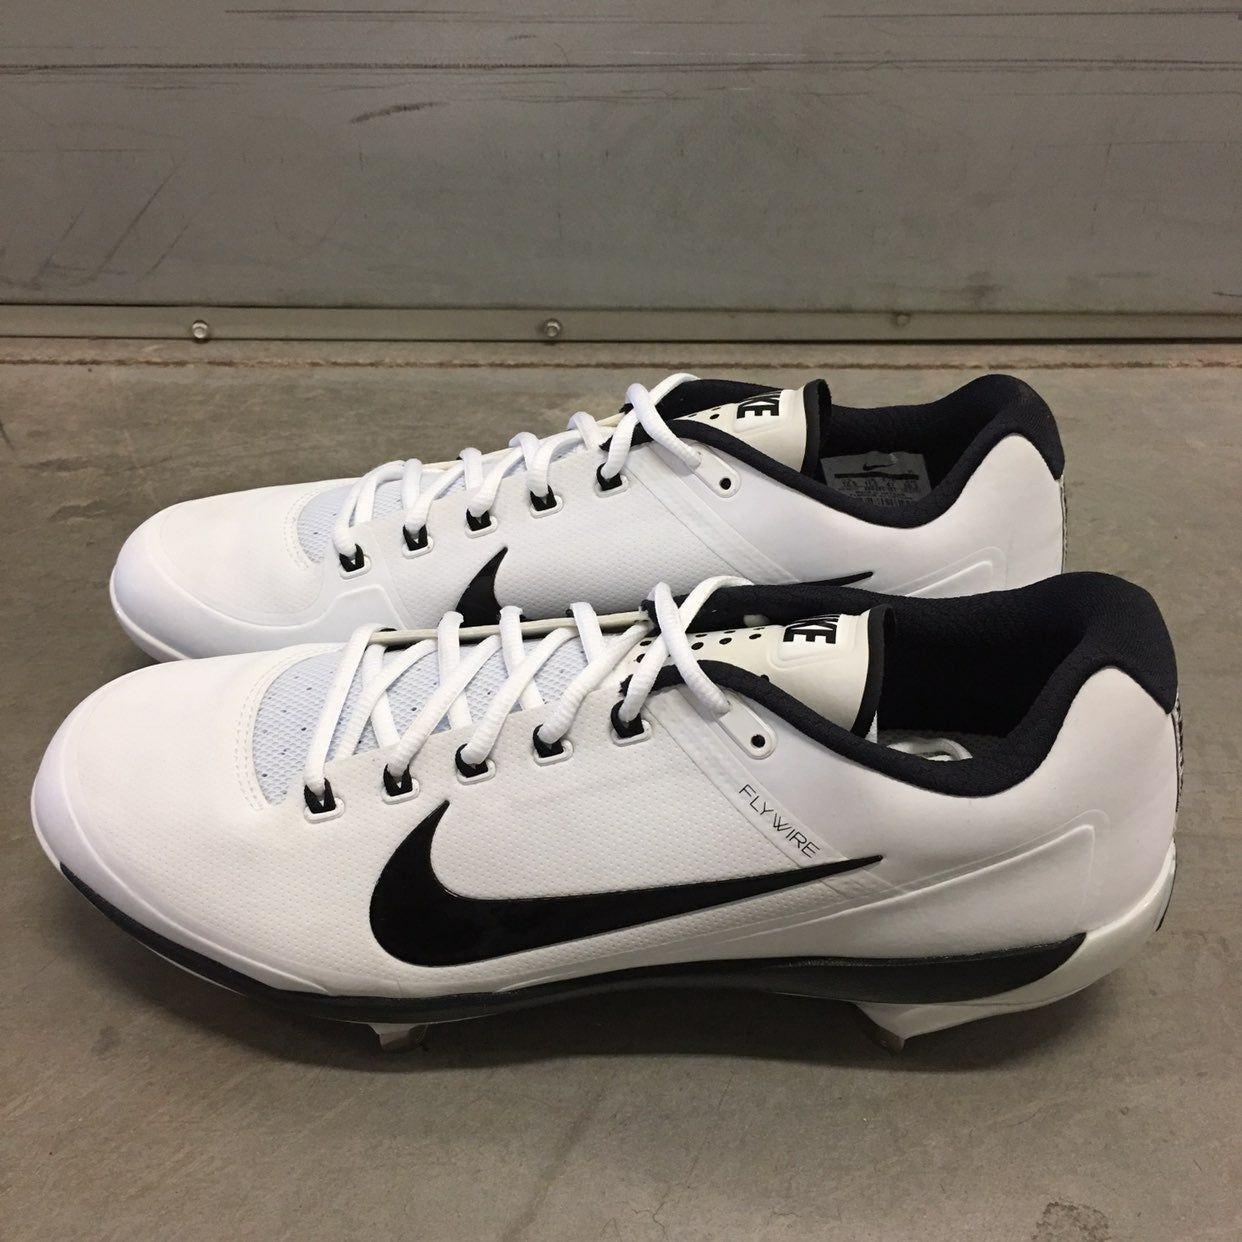 Nike cleats, Baseball cleats